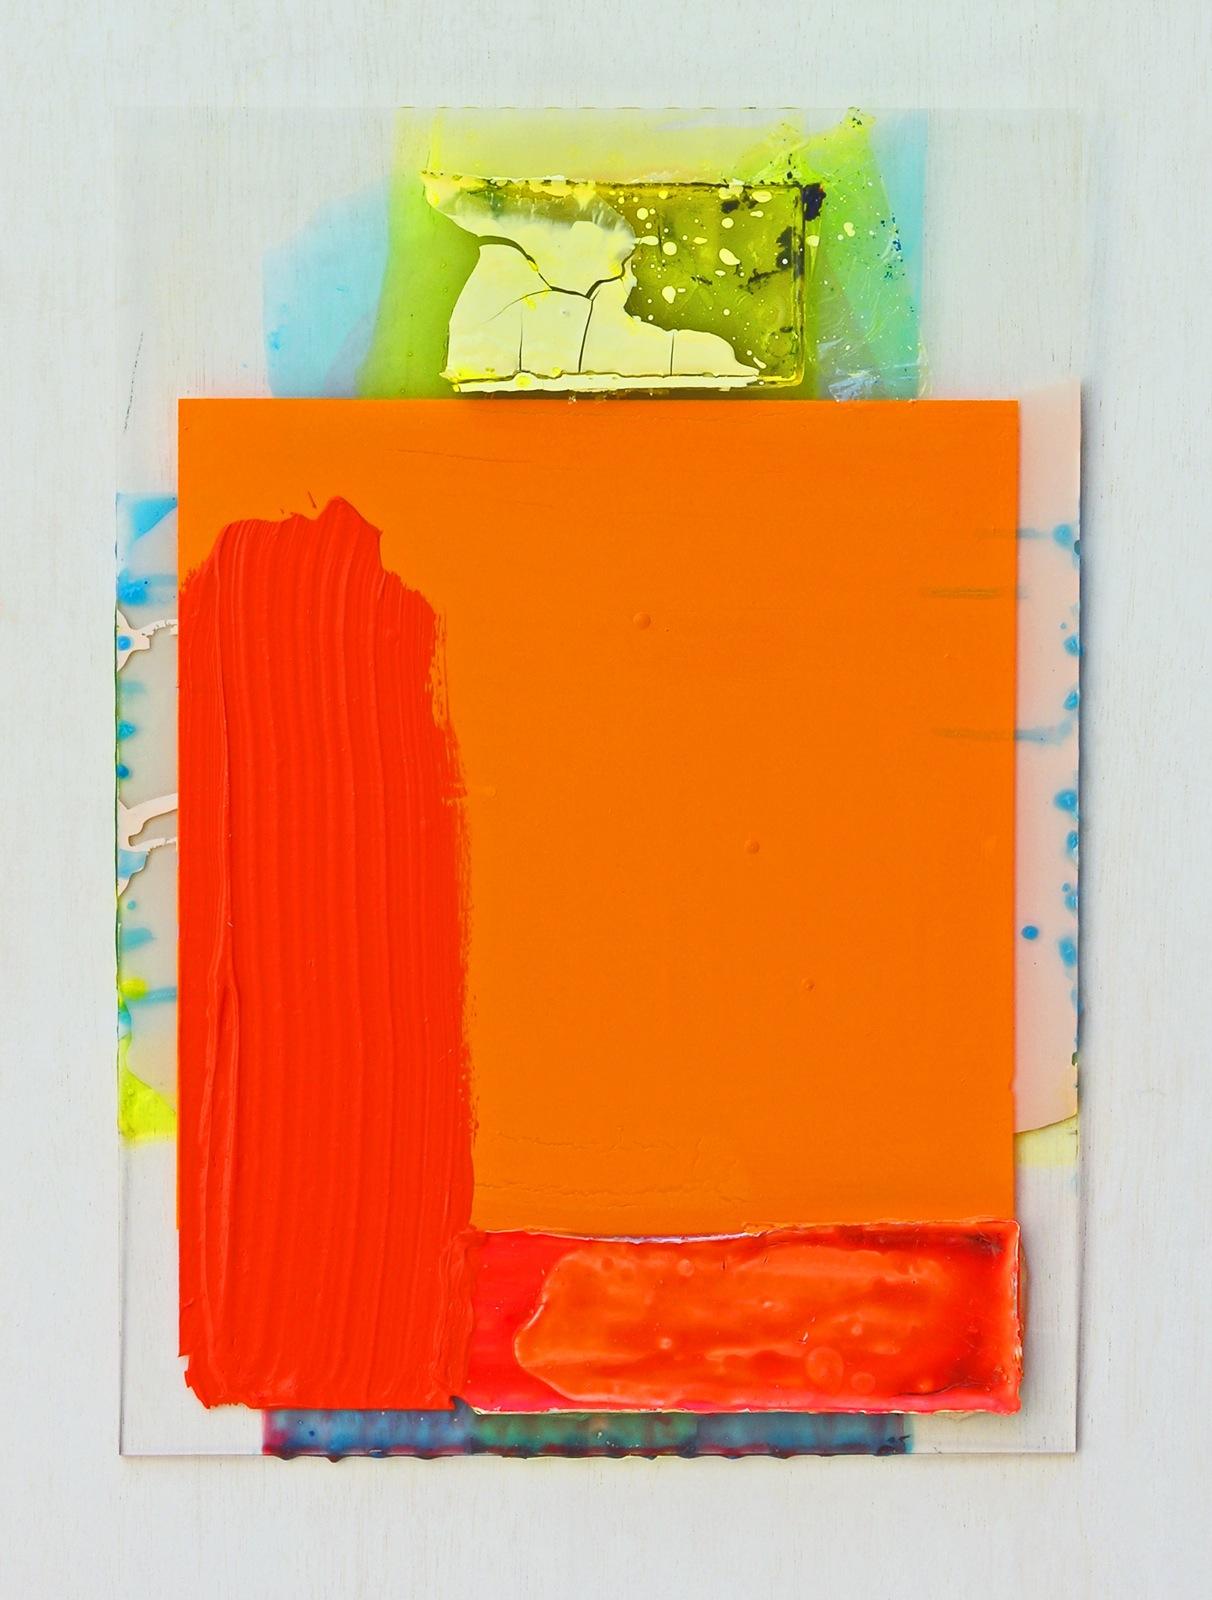 """Scheiblette IV"", 42x30 cm, Acrylfarben, Plexi, 2010"